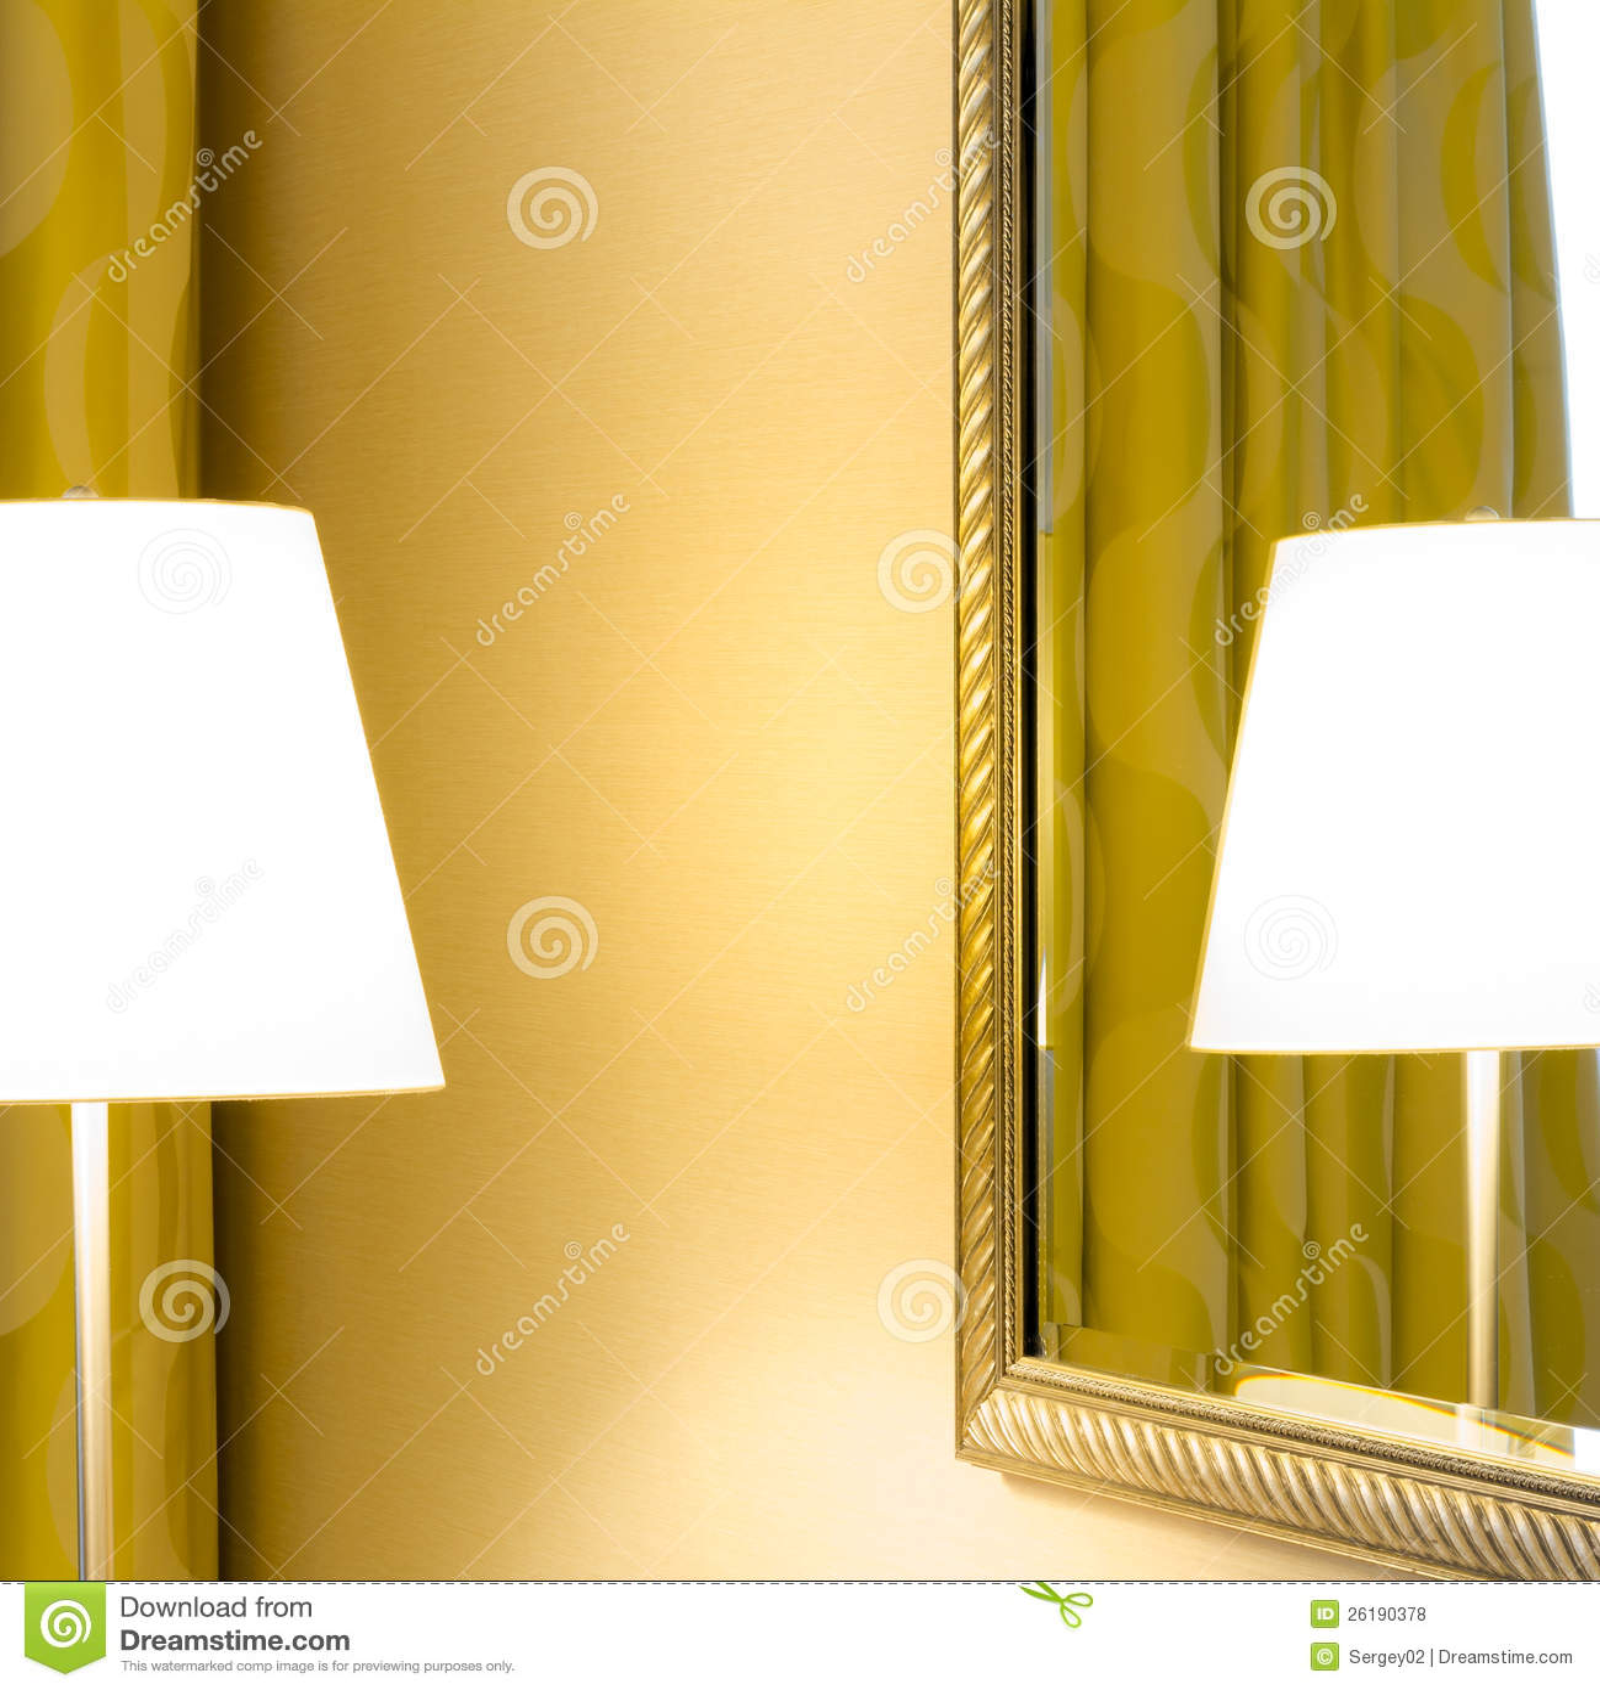 Interior Design Royalty Free Stock Photos Image 26190378